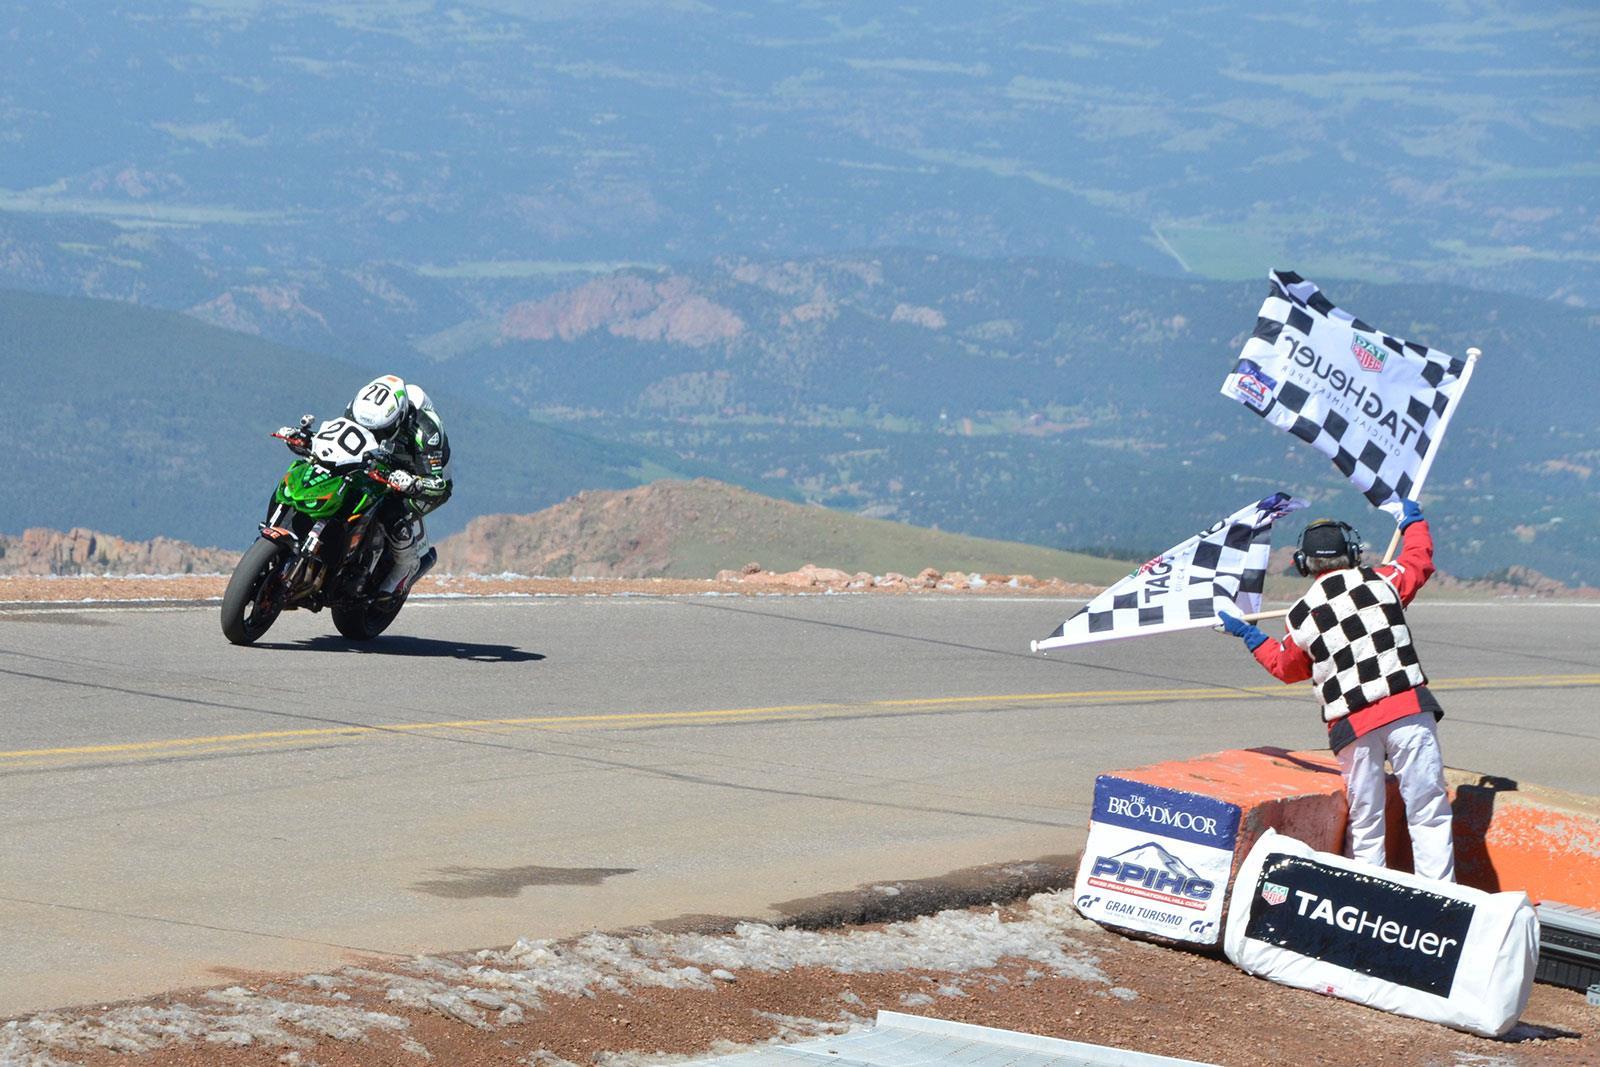 No motorbike races for Pikes Peak 2020